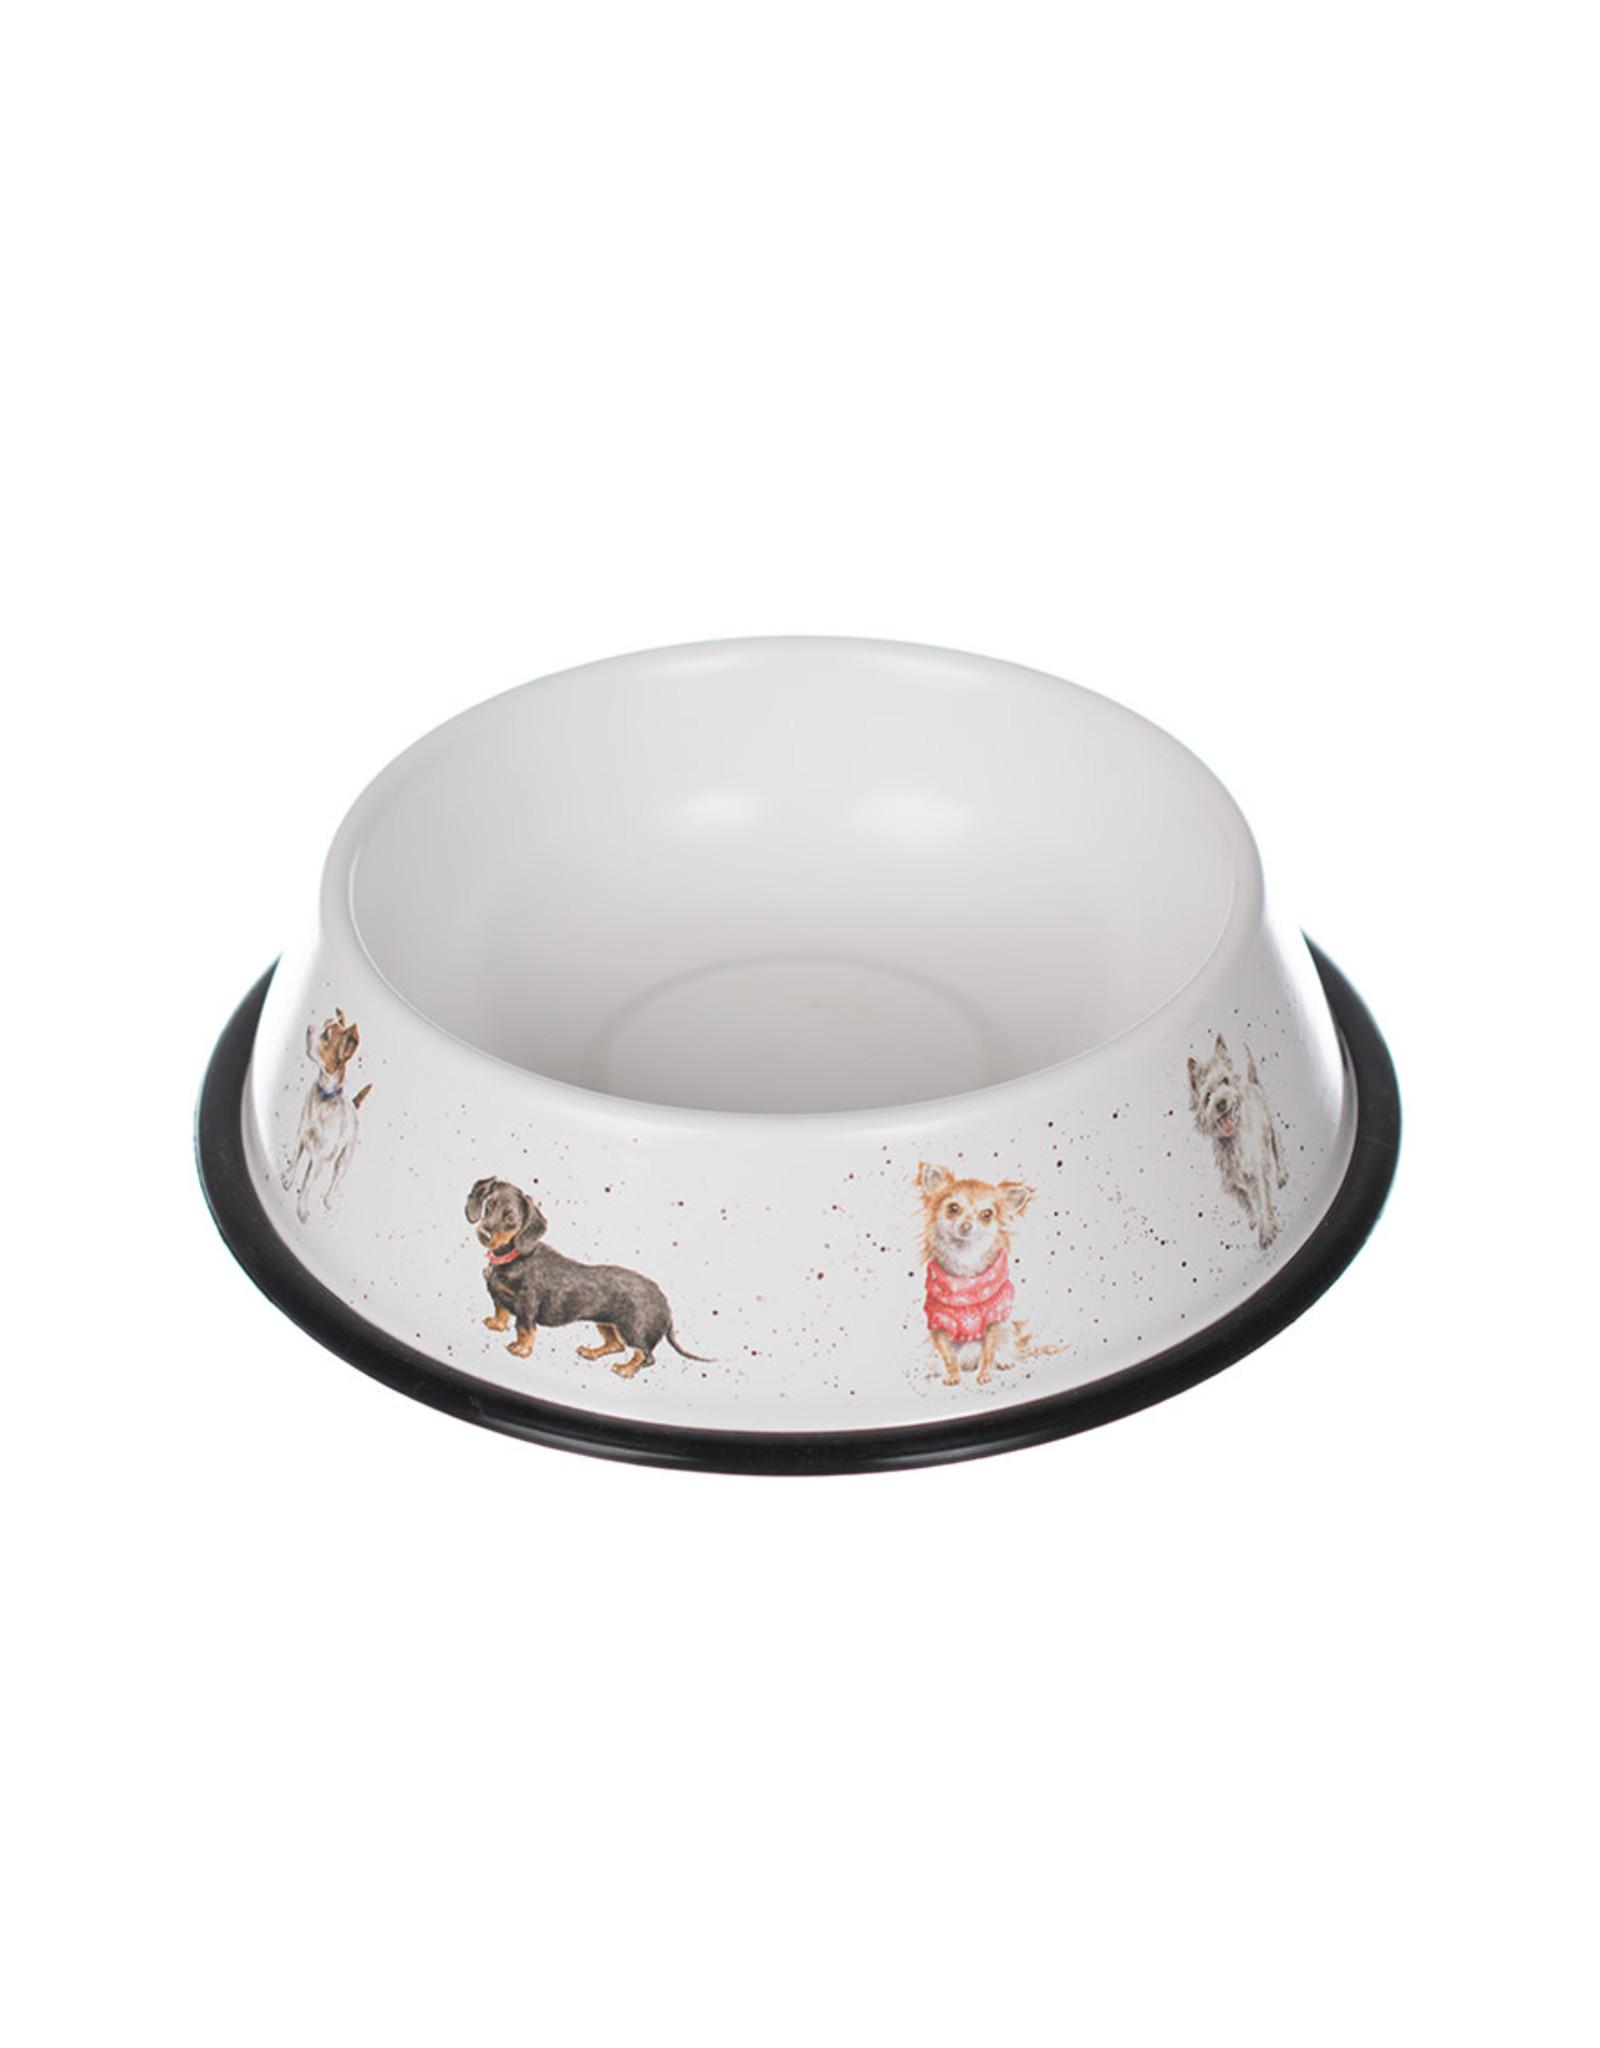 Wrendale Bowl Tin - Dog - 29cm